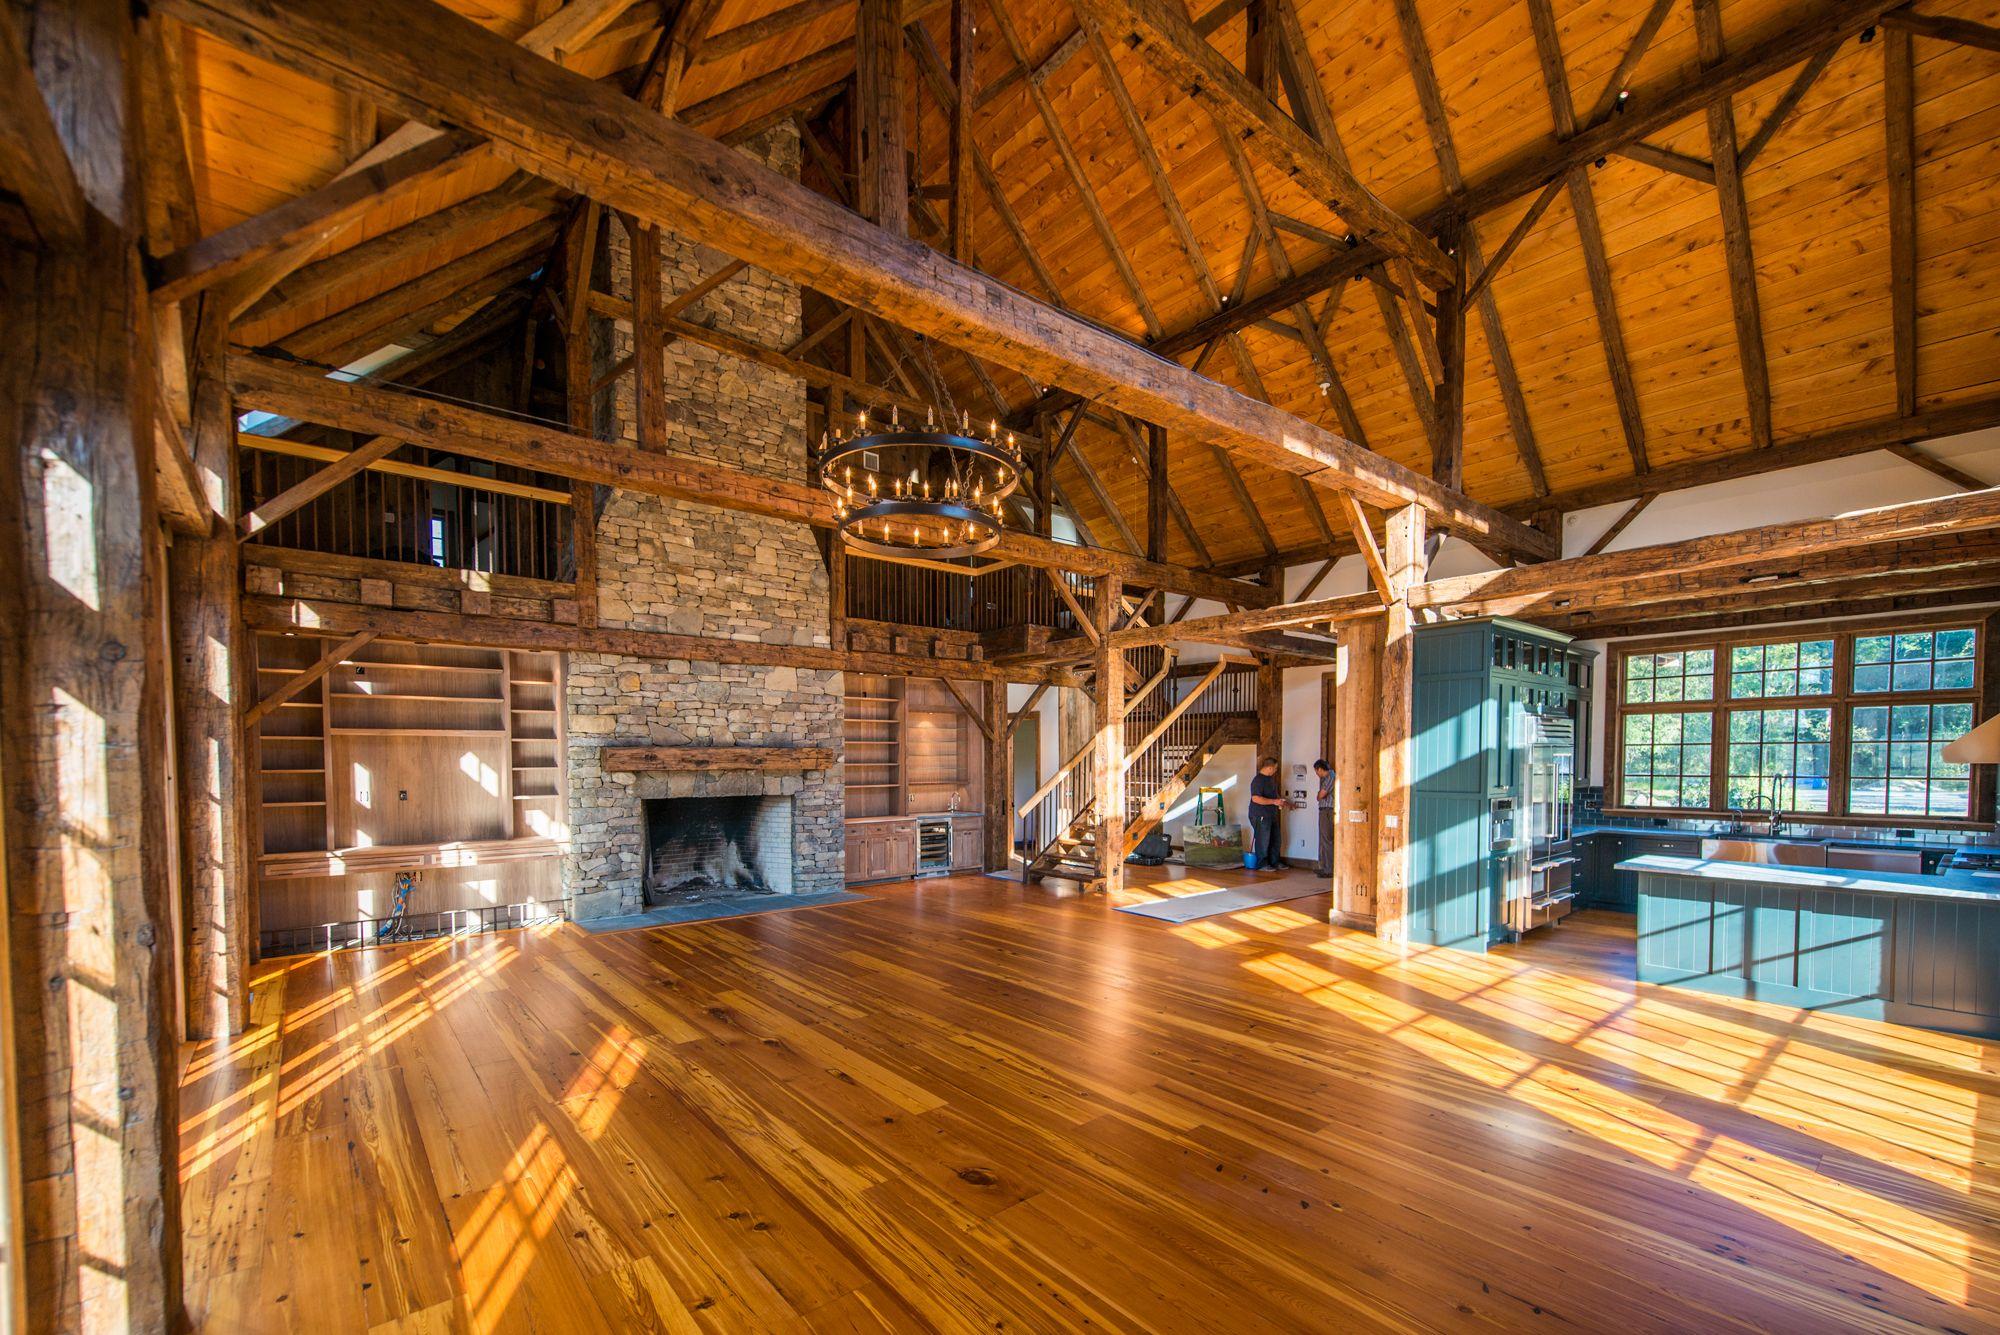 Scotch ridge barn home heritage restorations for Log pole barn